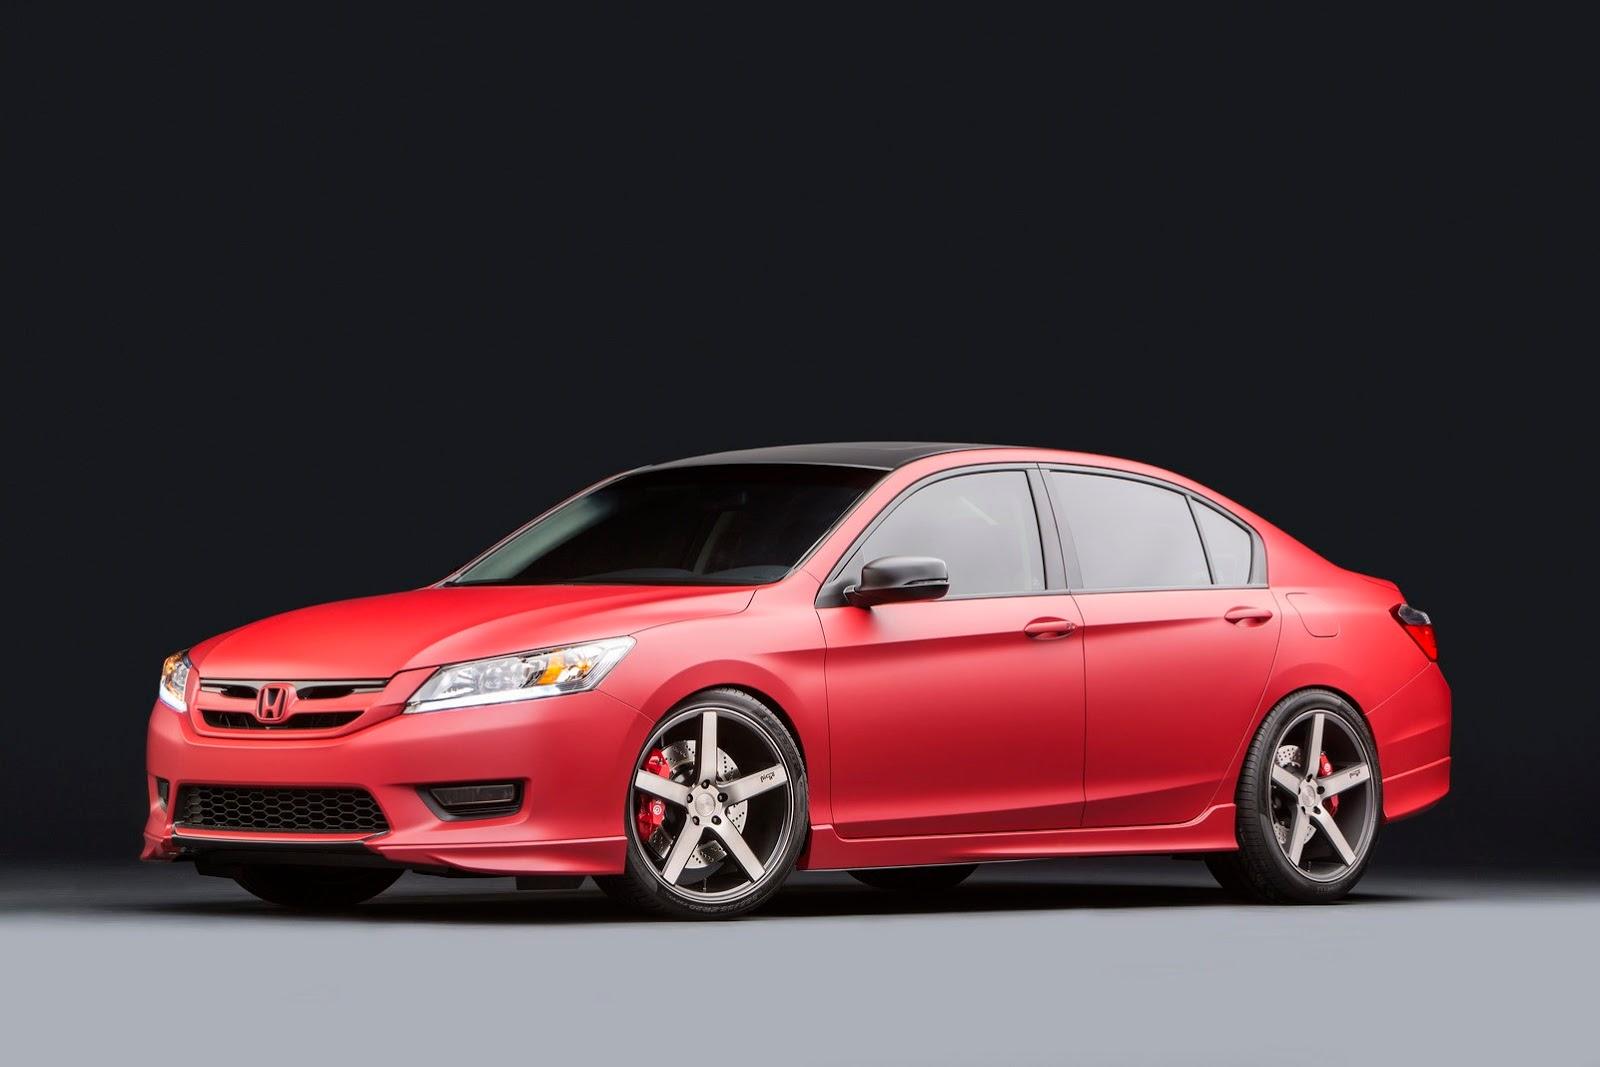 2015 honda civic si coupe rear three quarters view car interior design. Black Bedroom Furniture Sets. Home Design Ideas